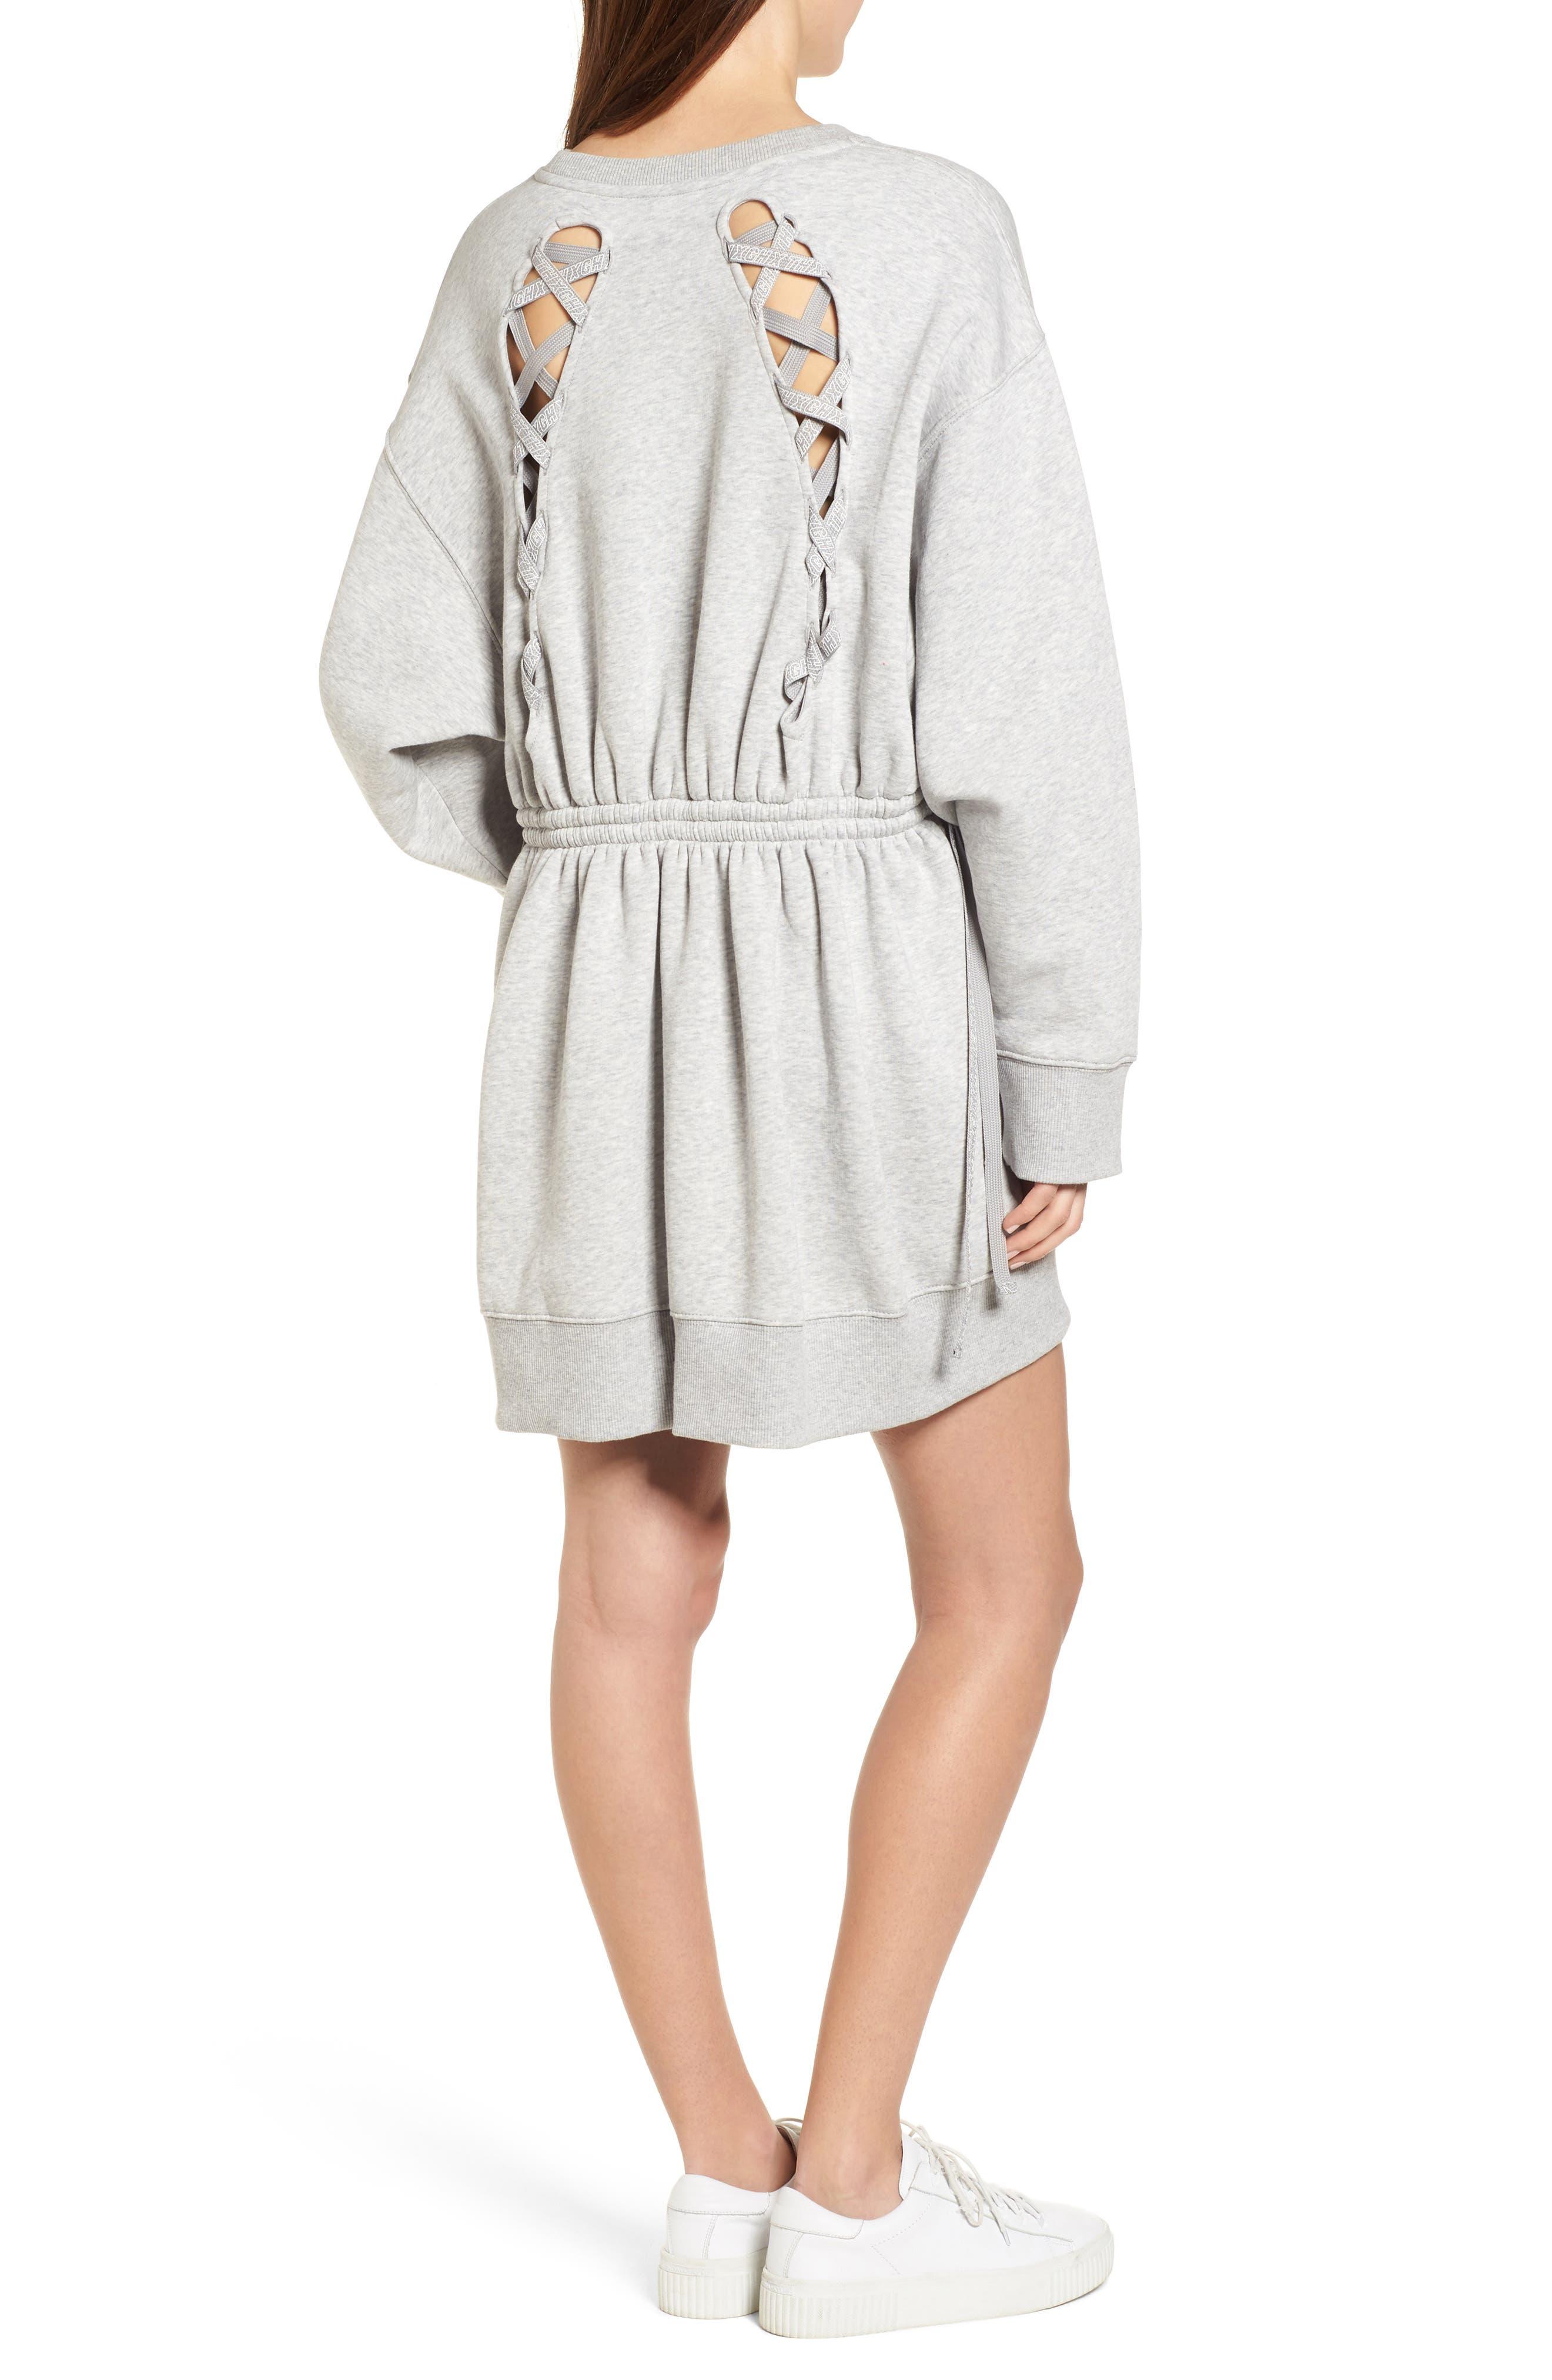 x Gigi Hadid Sweatshirt Dress,                             Alternate thumbnail 2, color,                             020